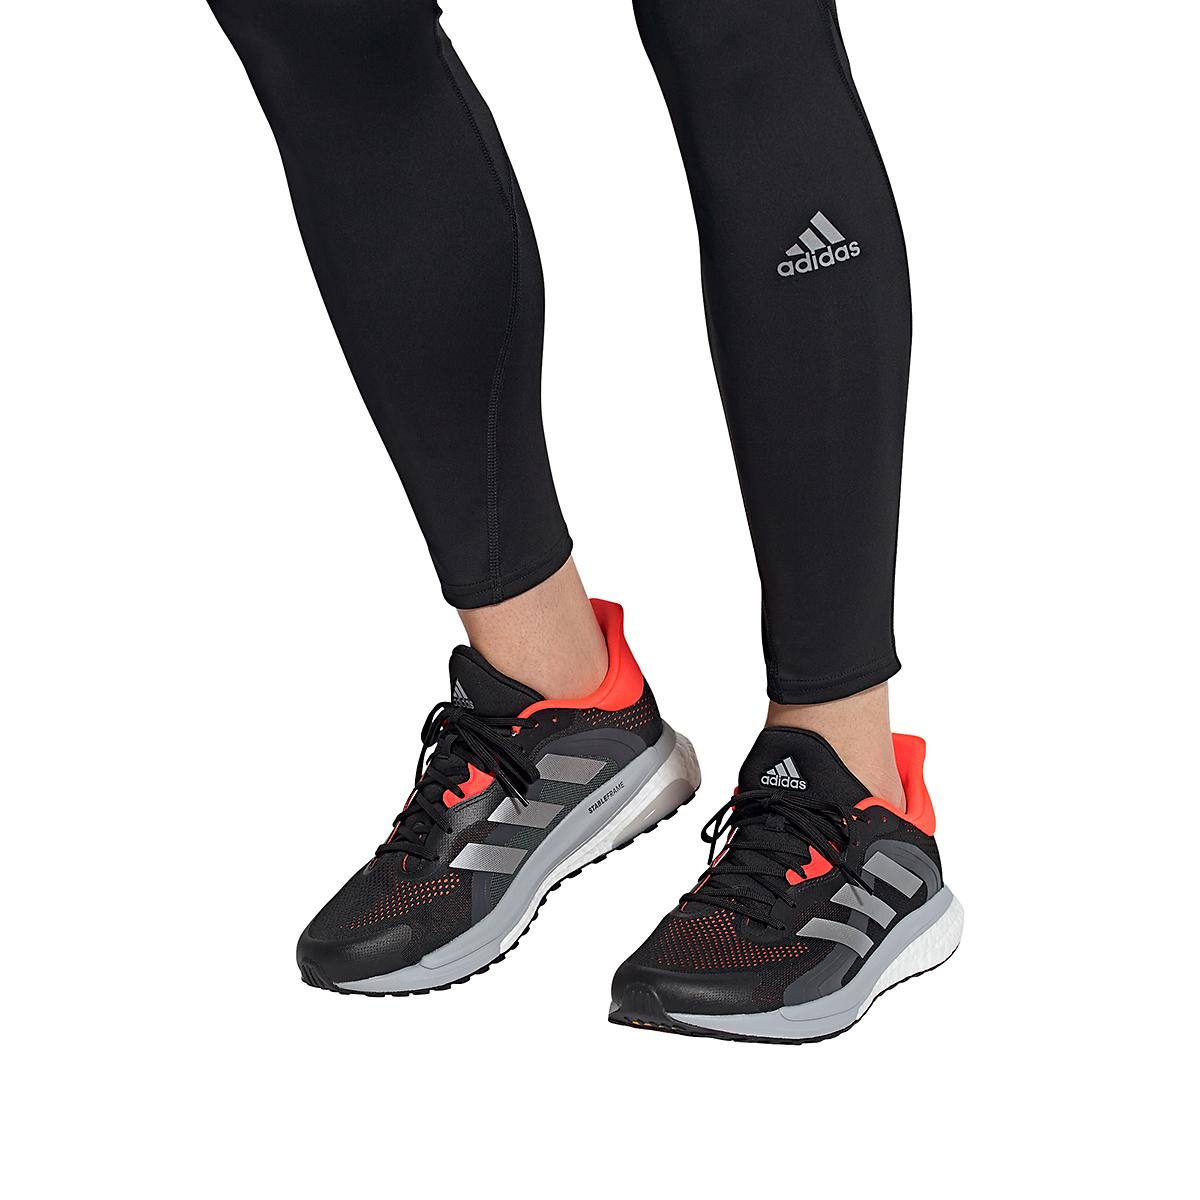 Men's Adidas Solar Glide 4 ST Running Shoe - Color: Core Black/Grey/Solar Red - Size: 6.5 - Width: Regular, Core Black/Grey/Solar Red, large, image 7